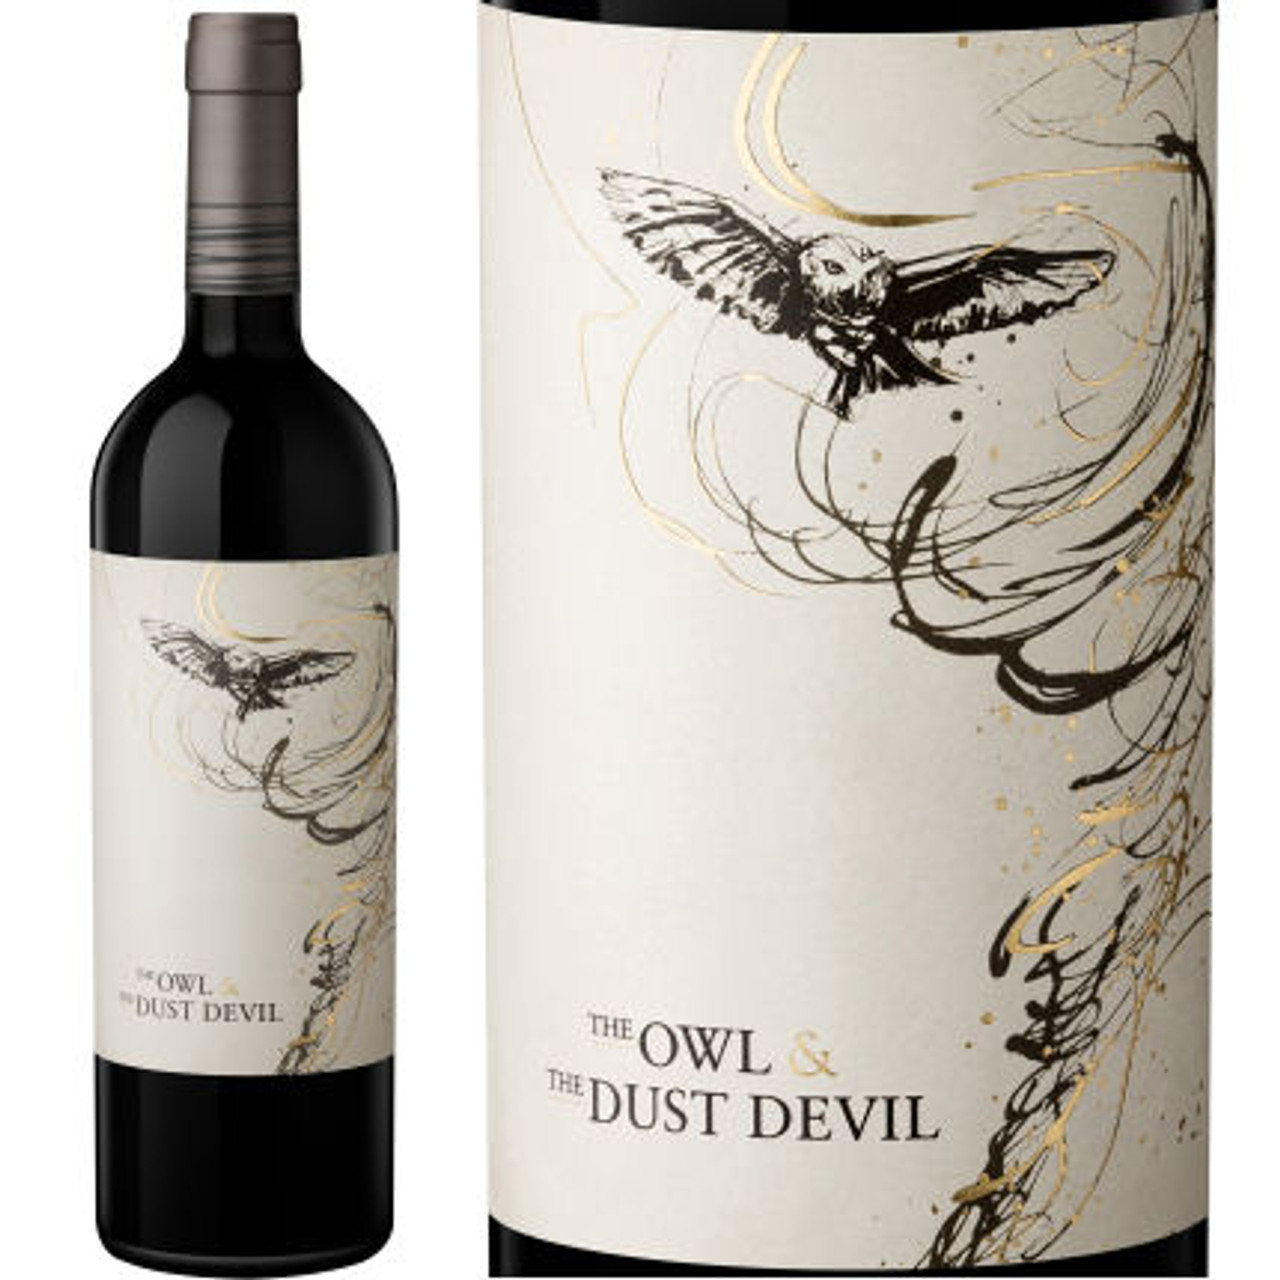 Finca Decero Owl and the Dust Devil Mendoza Red Blend